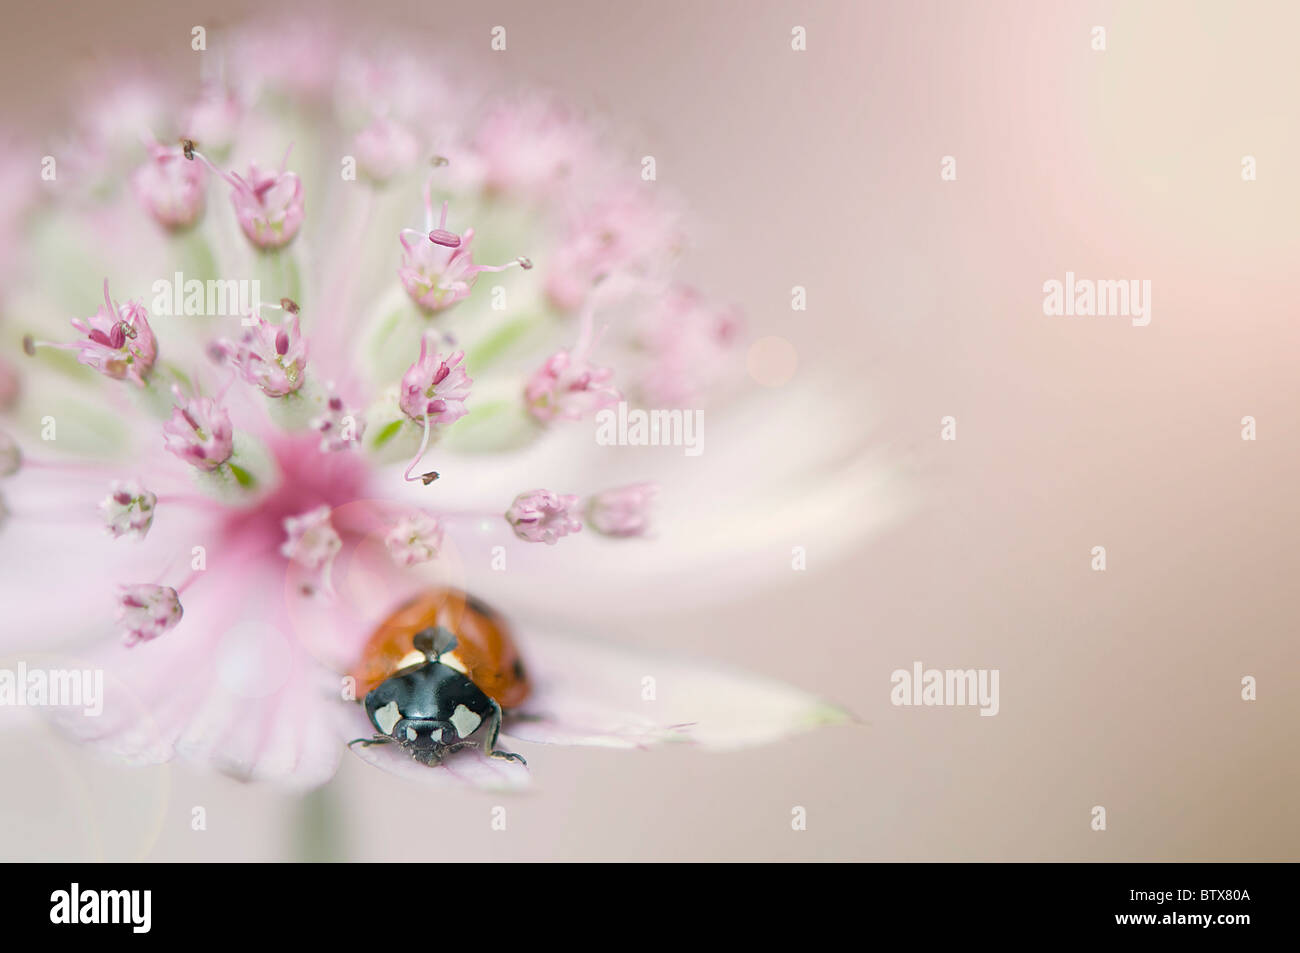 Coccinella septempunctata - Coccinella 7-punctata - 7-spot Ladybird on an Astrantia flower - Stock Image